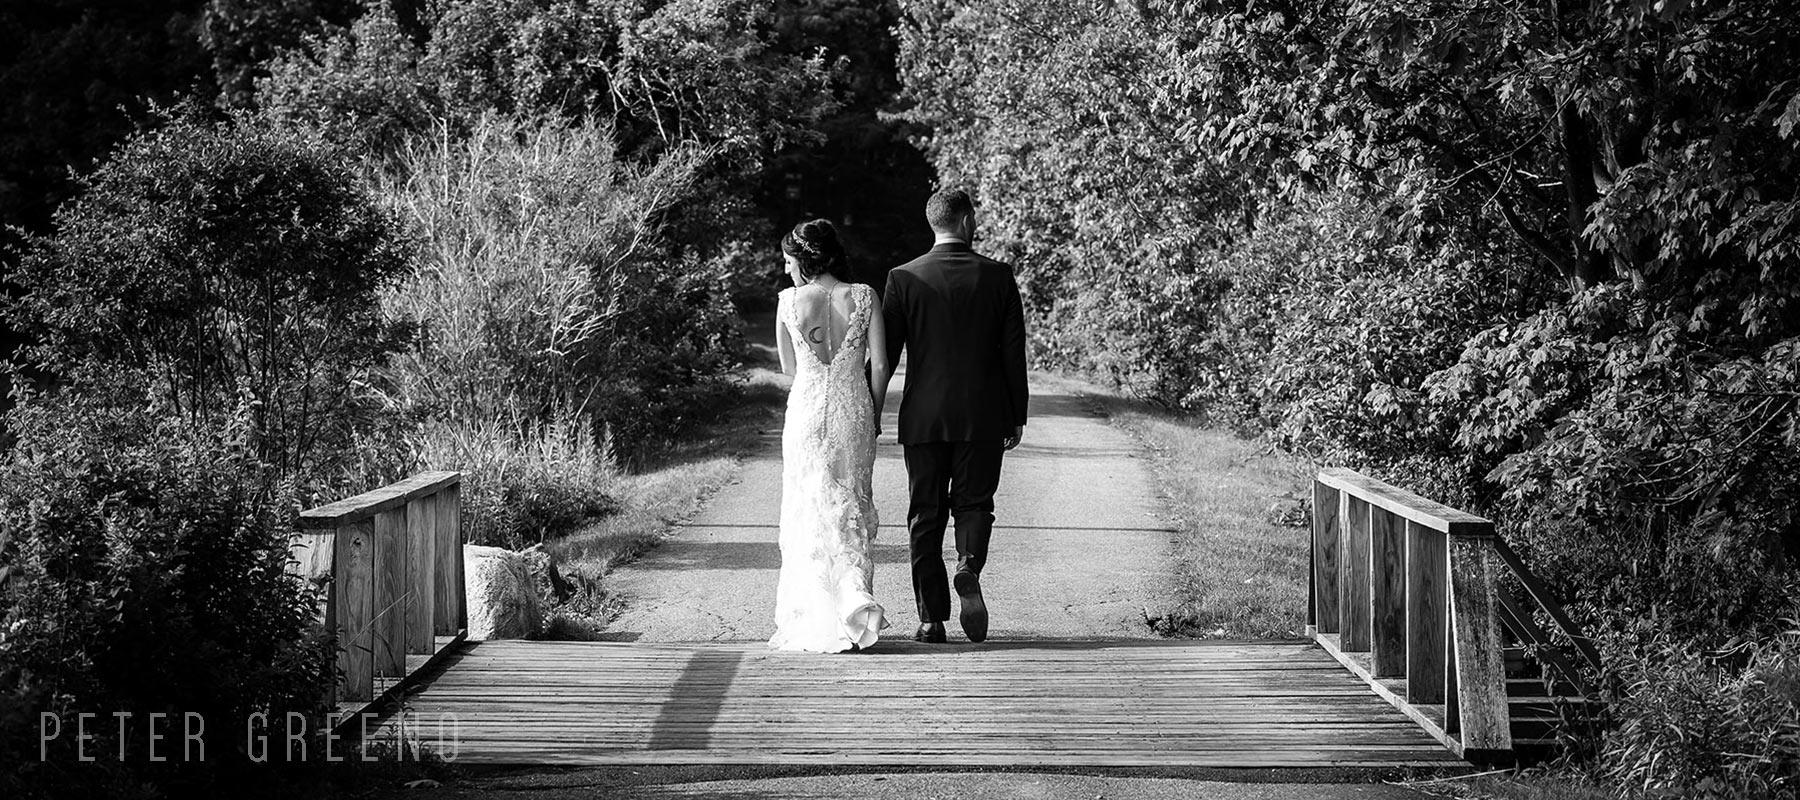 Sebasco Harbor Resort Weddings by Peter Greeno